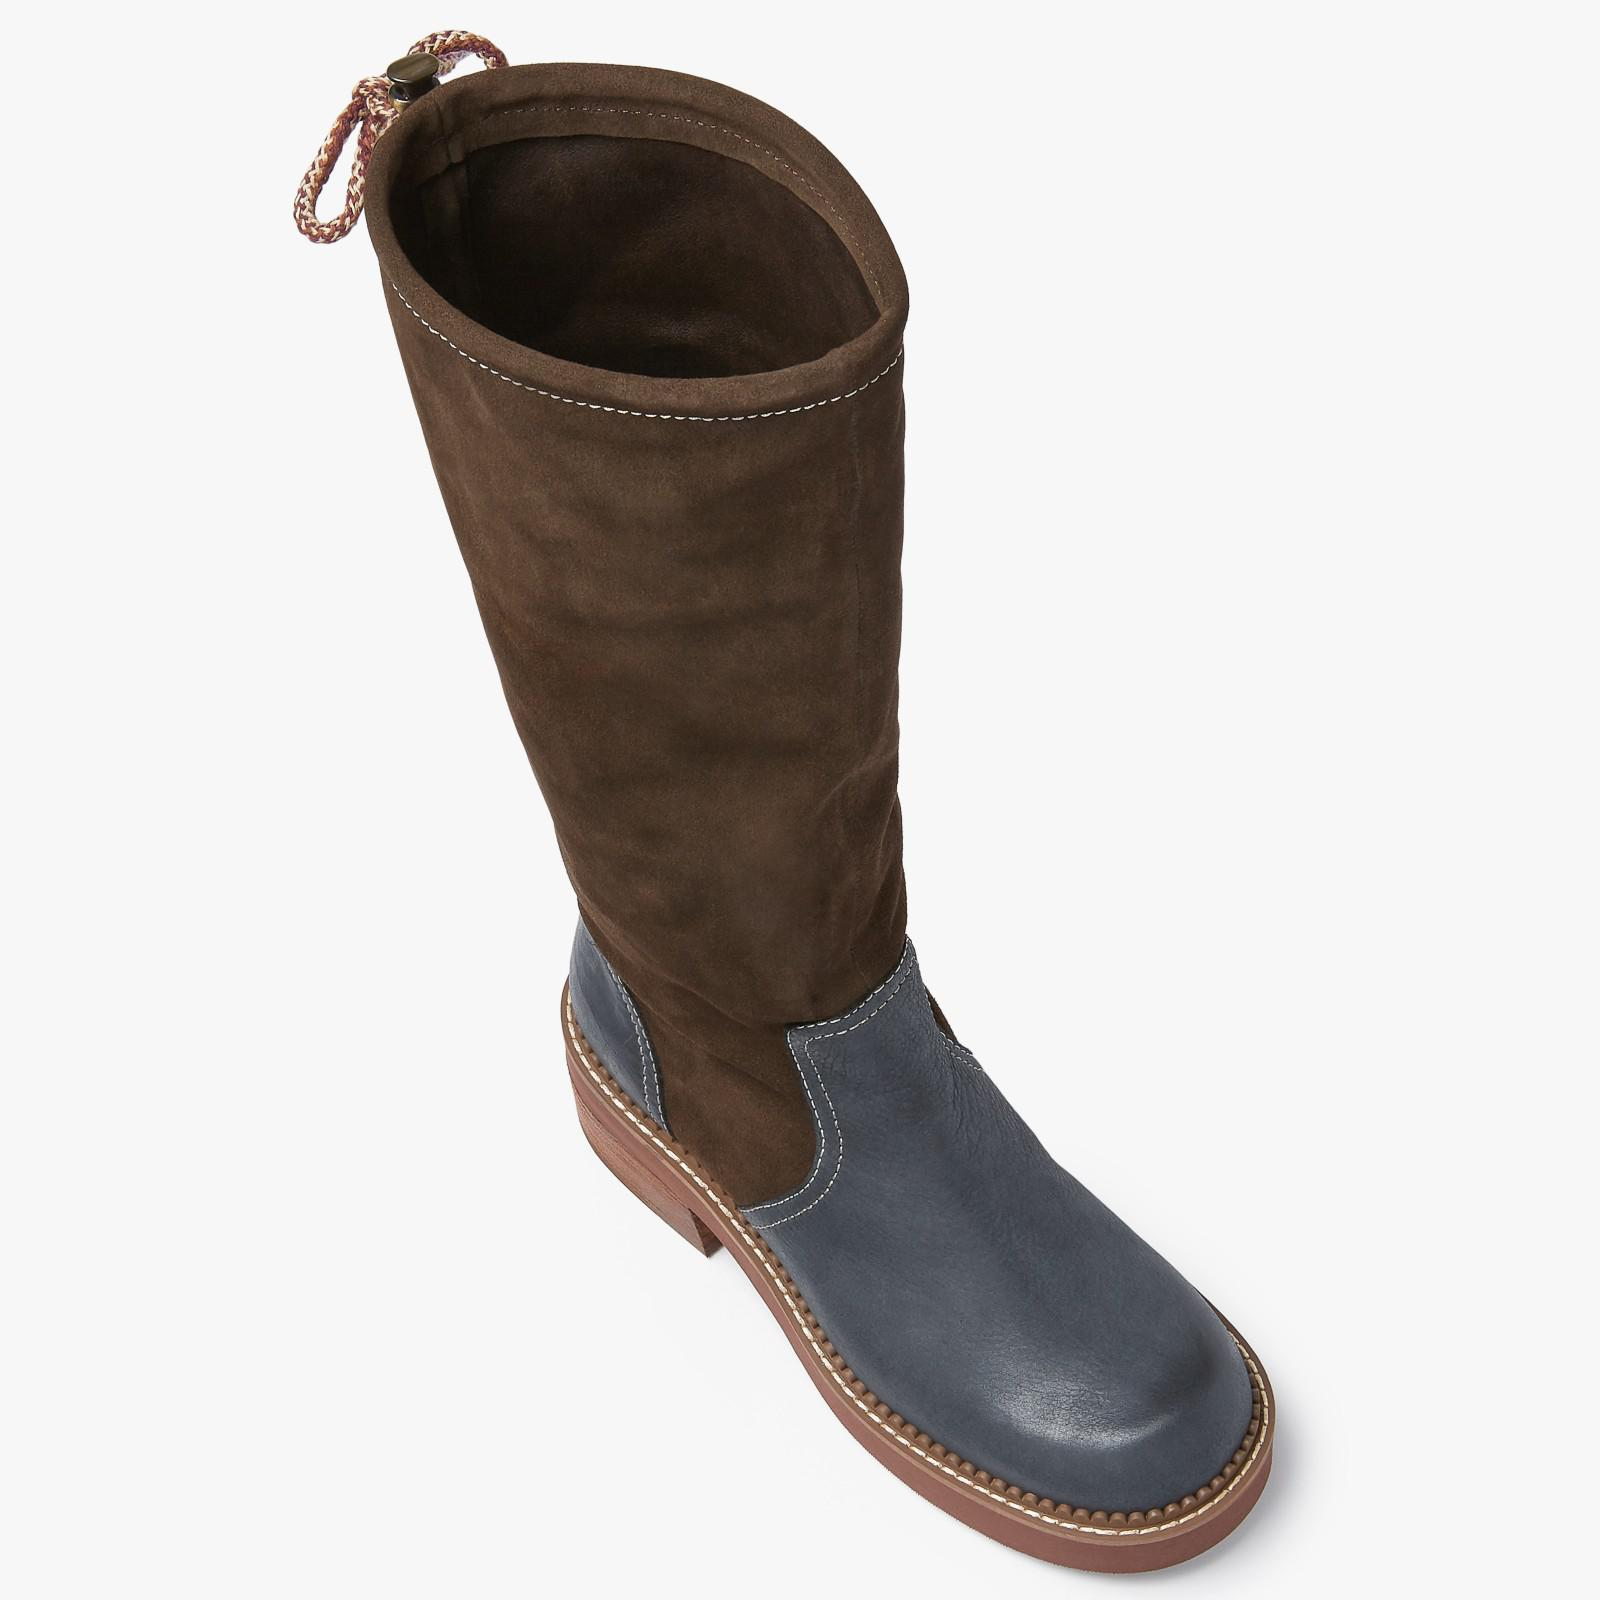 94e2b2b654 See By Chloé Brown Dominika Country Calf Boots